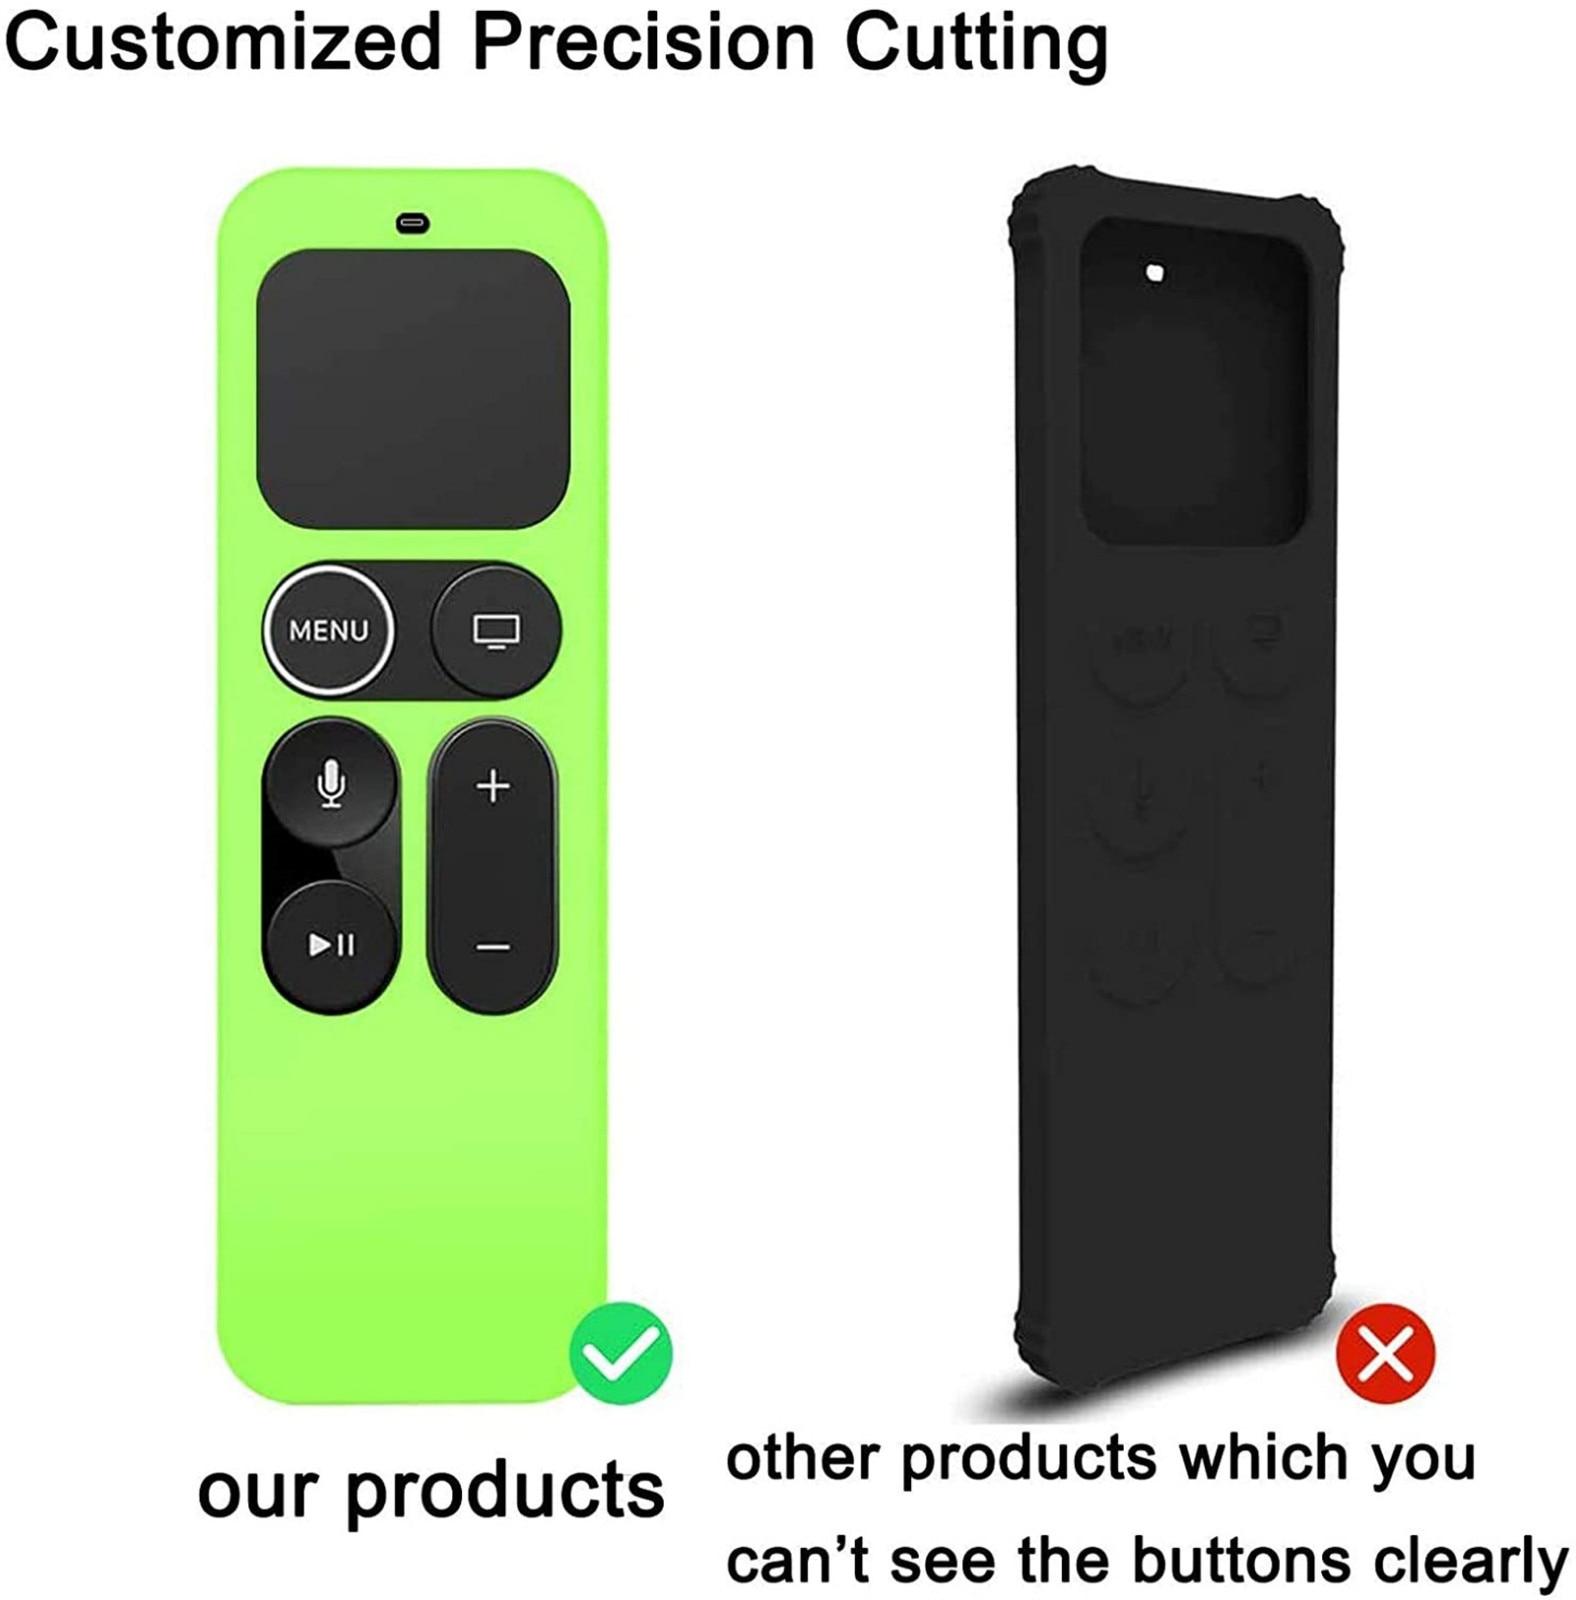 Para apple tv 4k 4th/5th tv vara remoto silicone caso capa protetora pele tv controle remoto capa poeira proteger saco de armazenamento